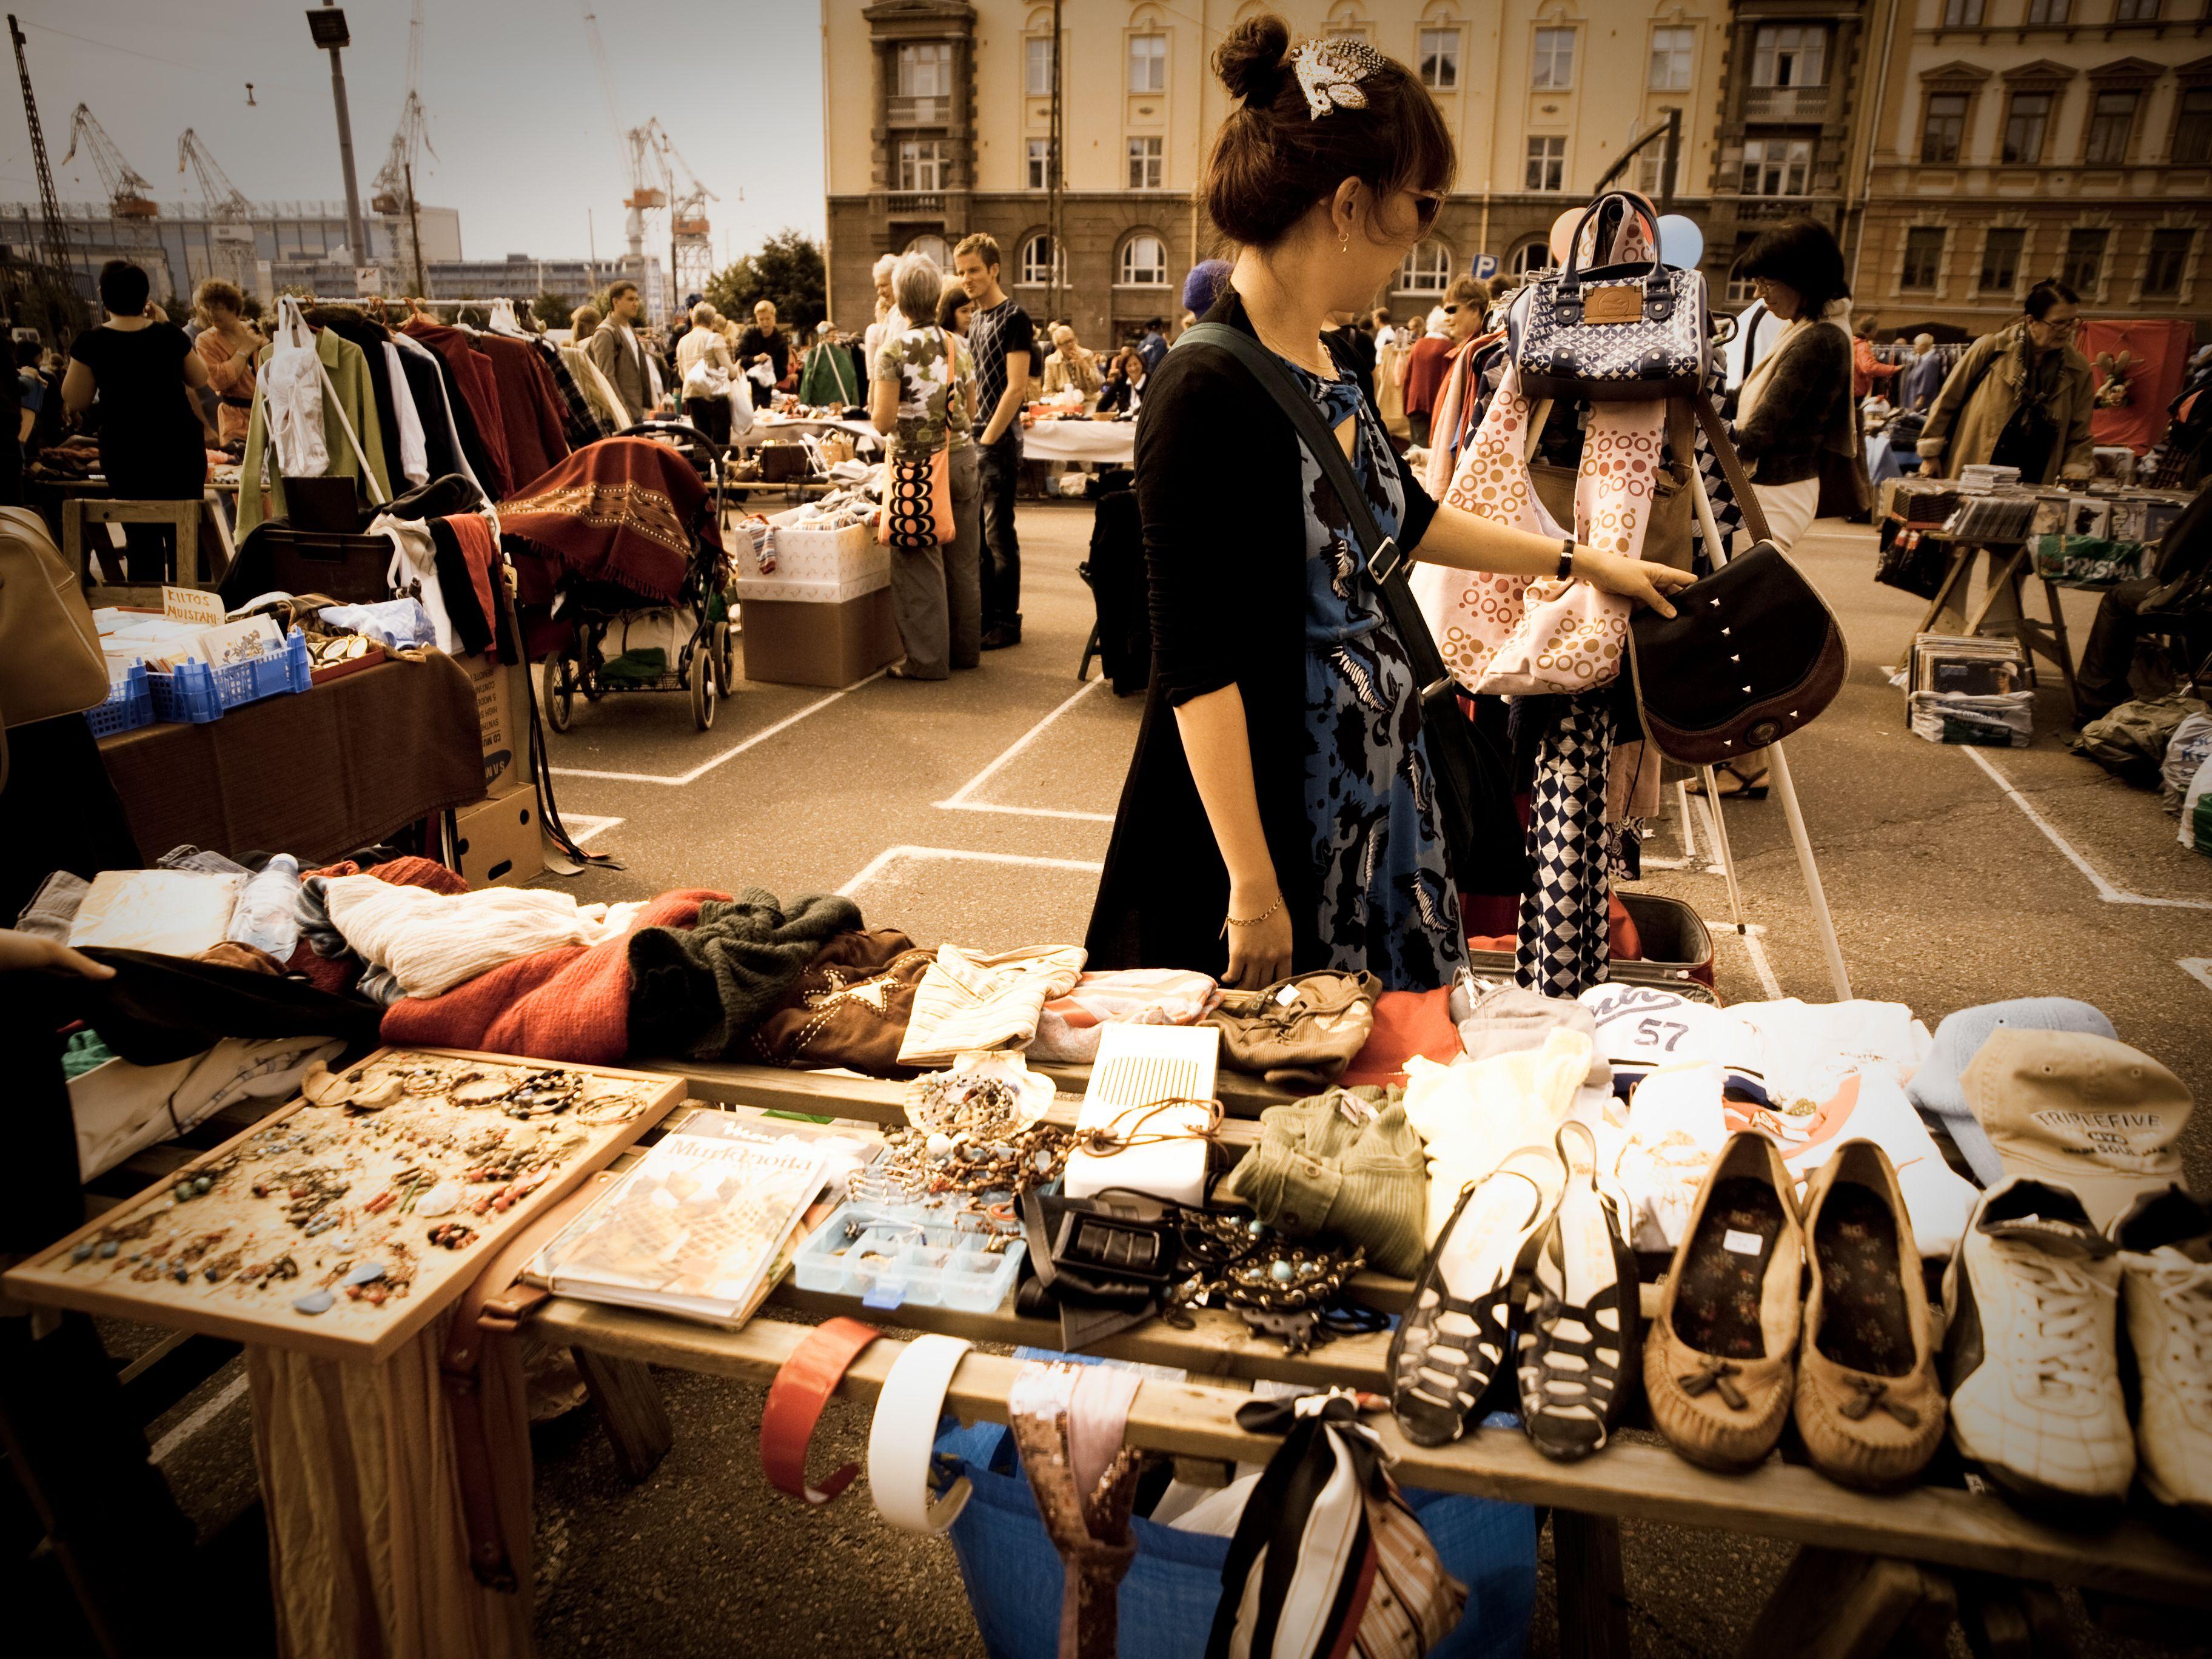 Craigslist 101 How To Buy Successfully Andrea Dekker Second Hand Shop Flea Market Fleas